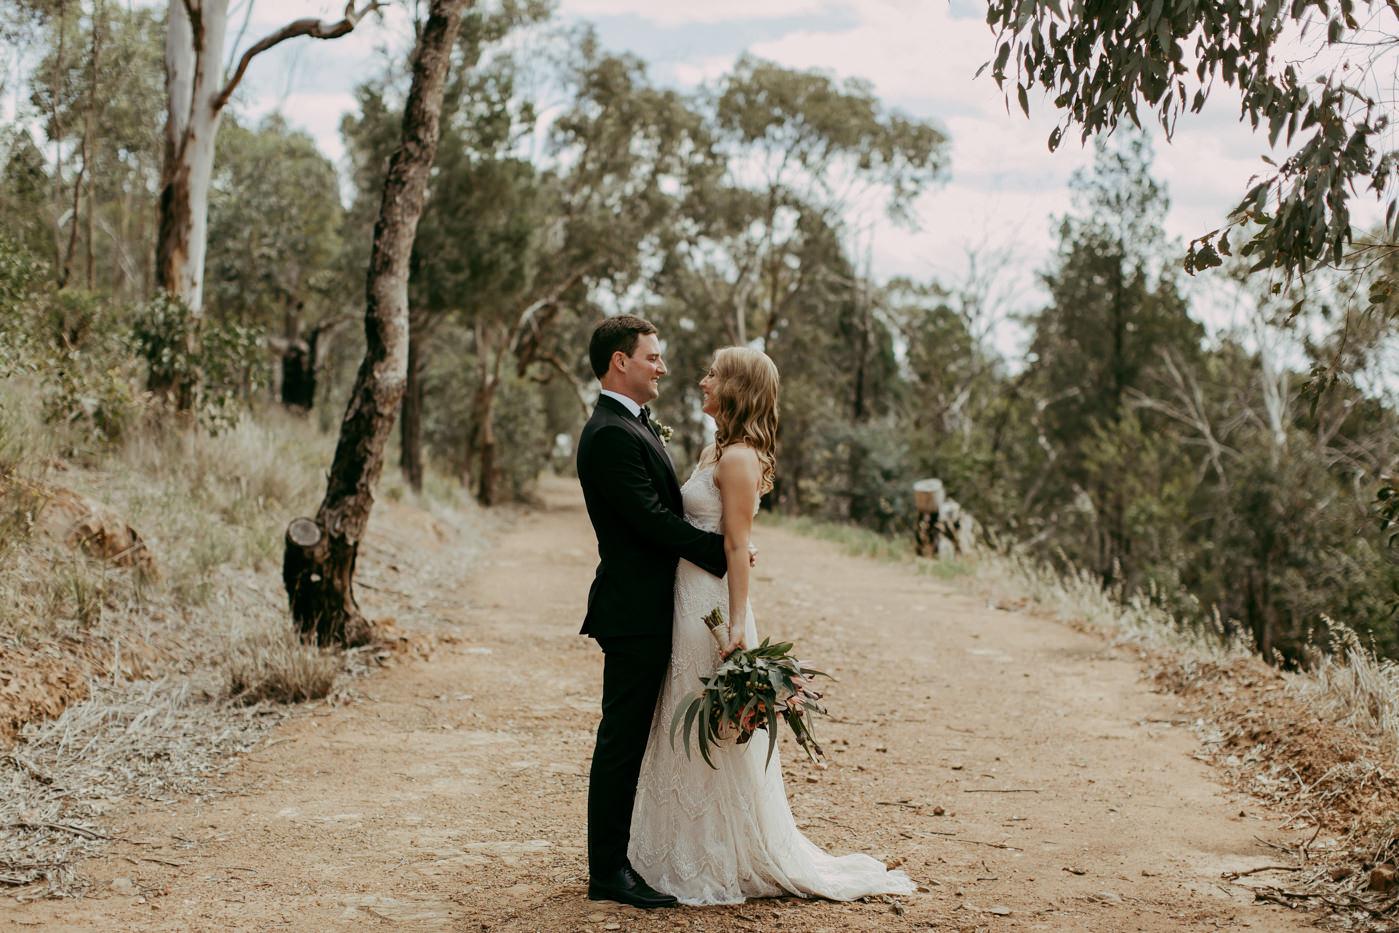 Anthony & Eliet - Wagga Wagga Wedding - Country NSW - Samantha Heather Photography-53.jpg